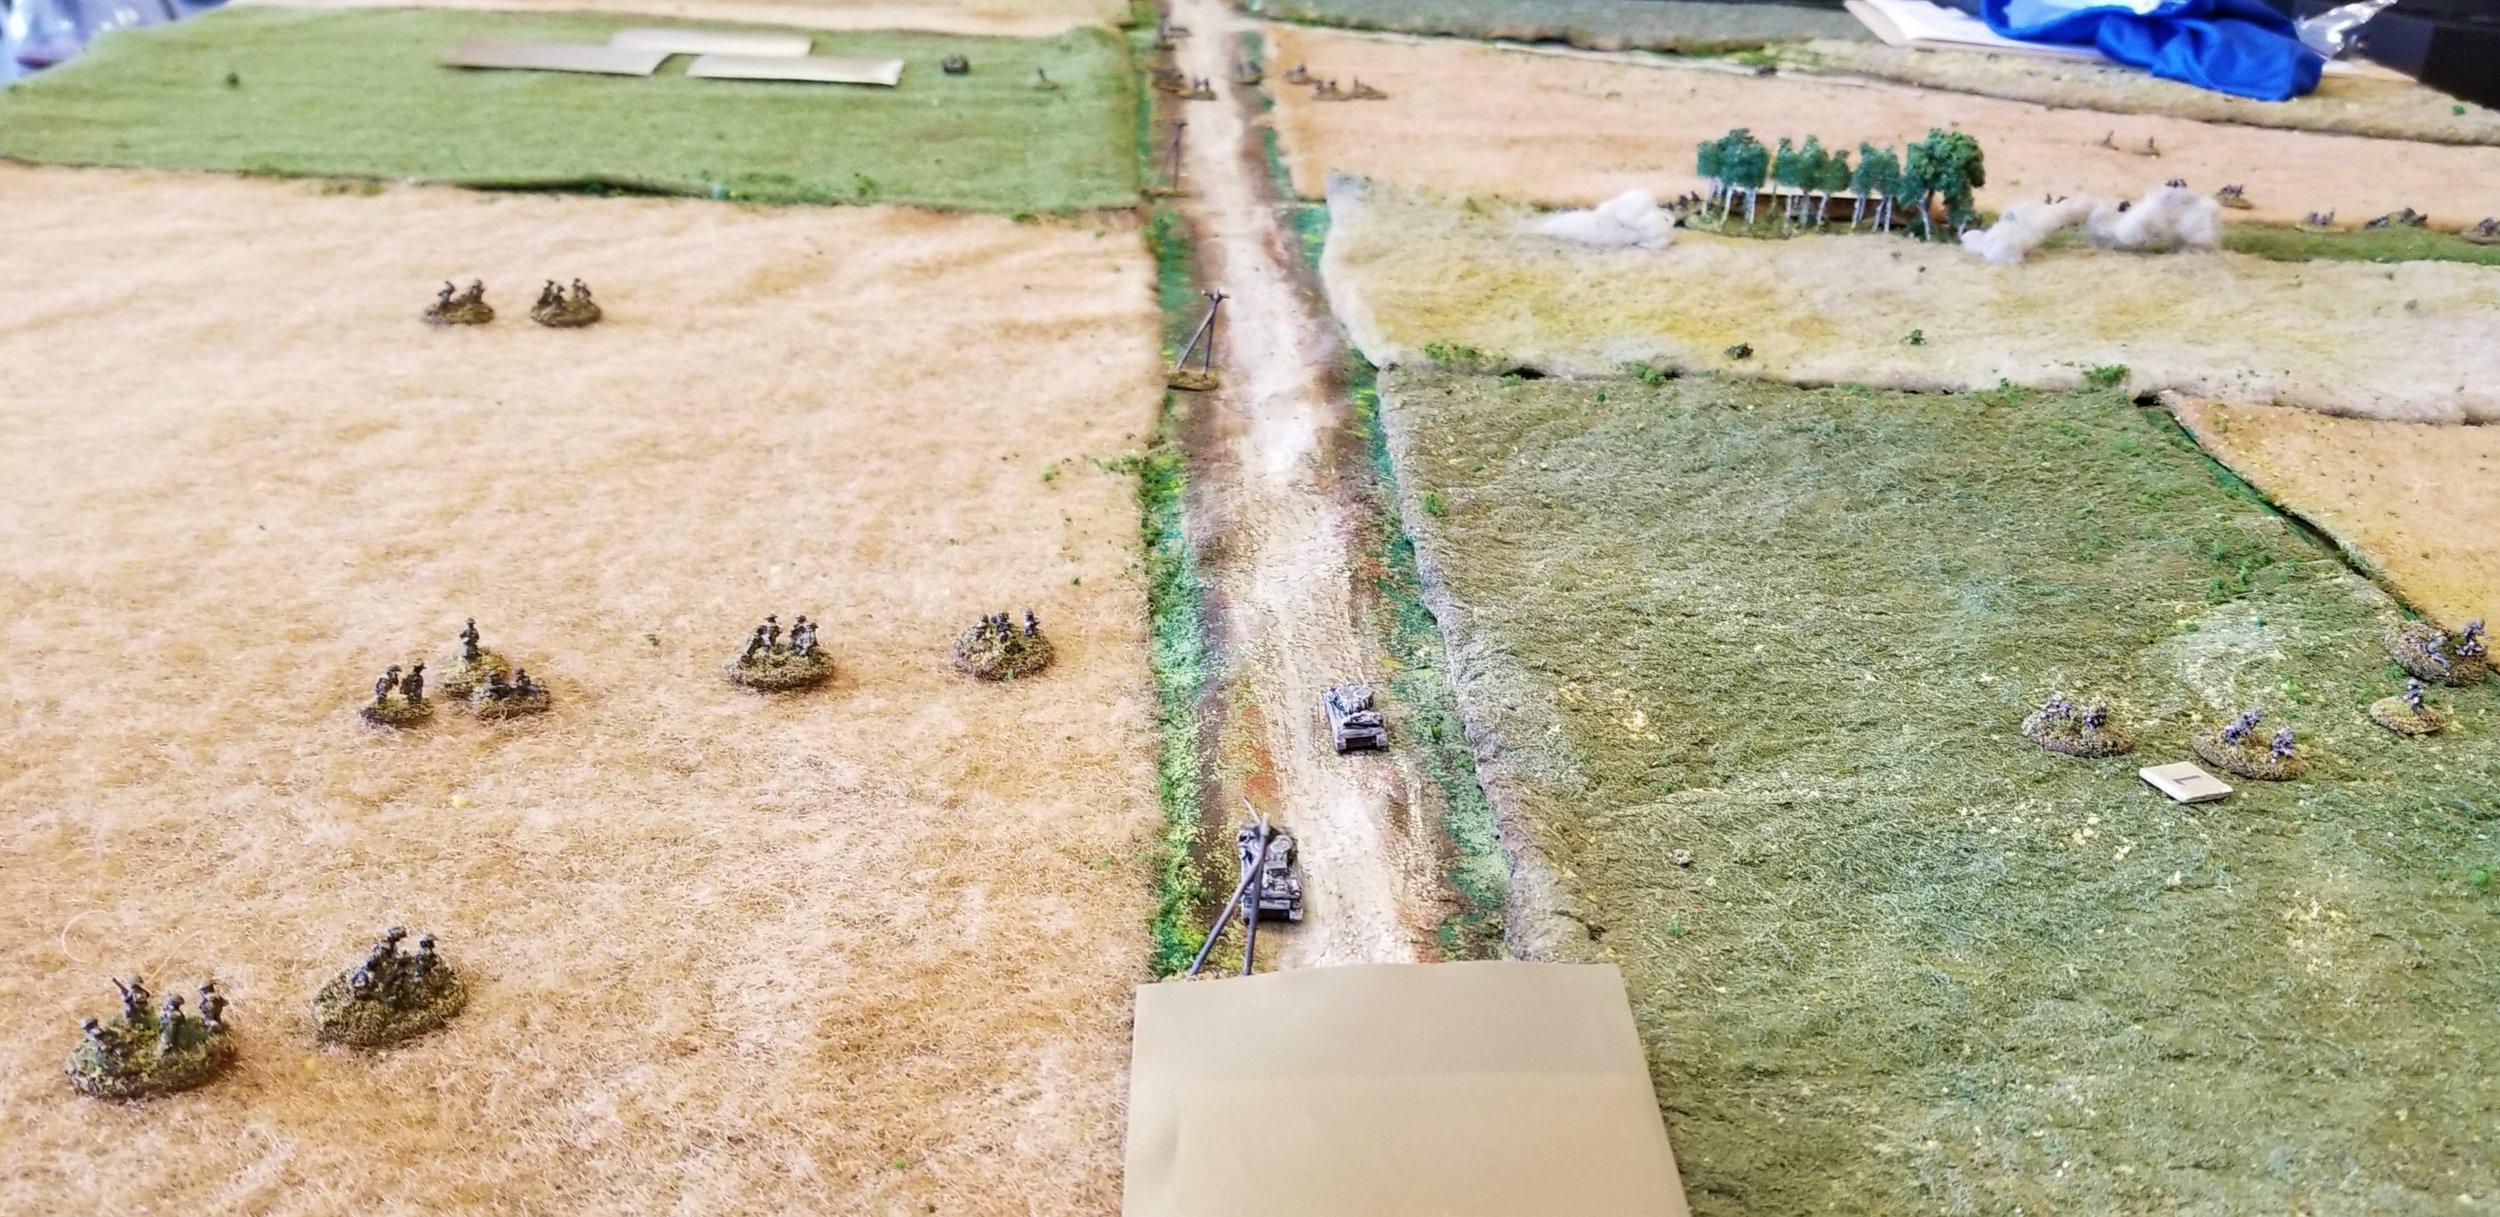 Sherwood Rangers' Shermans arrive